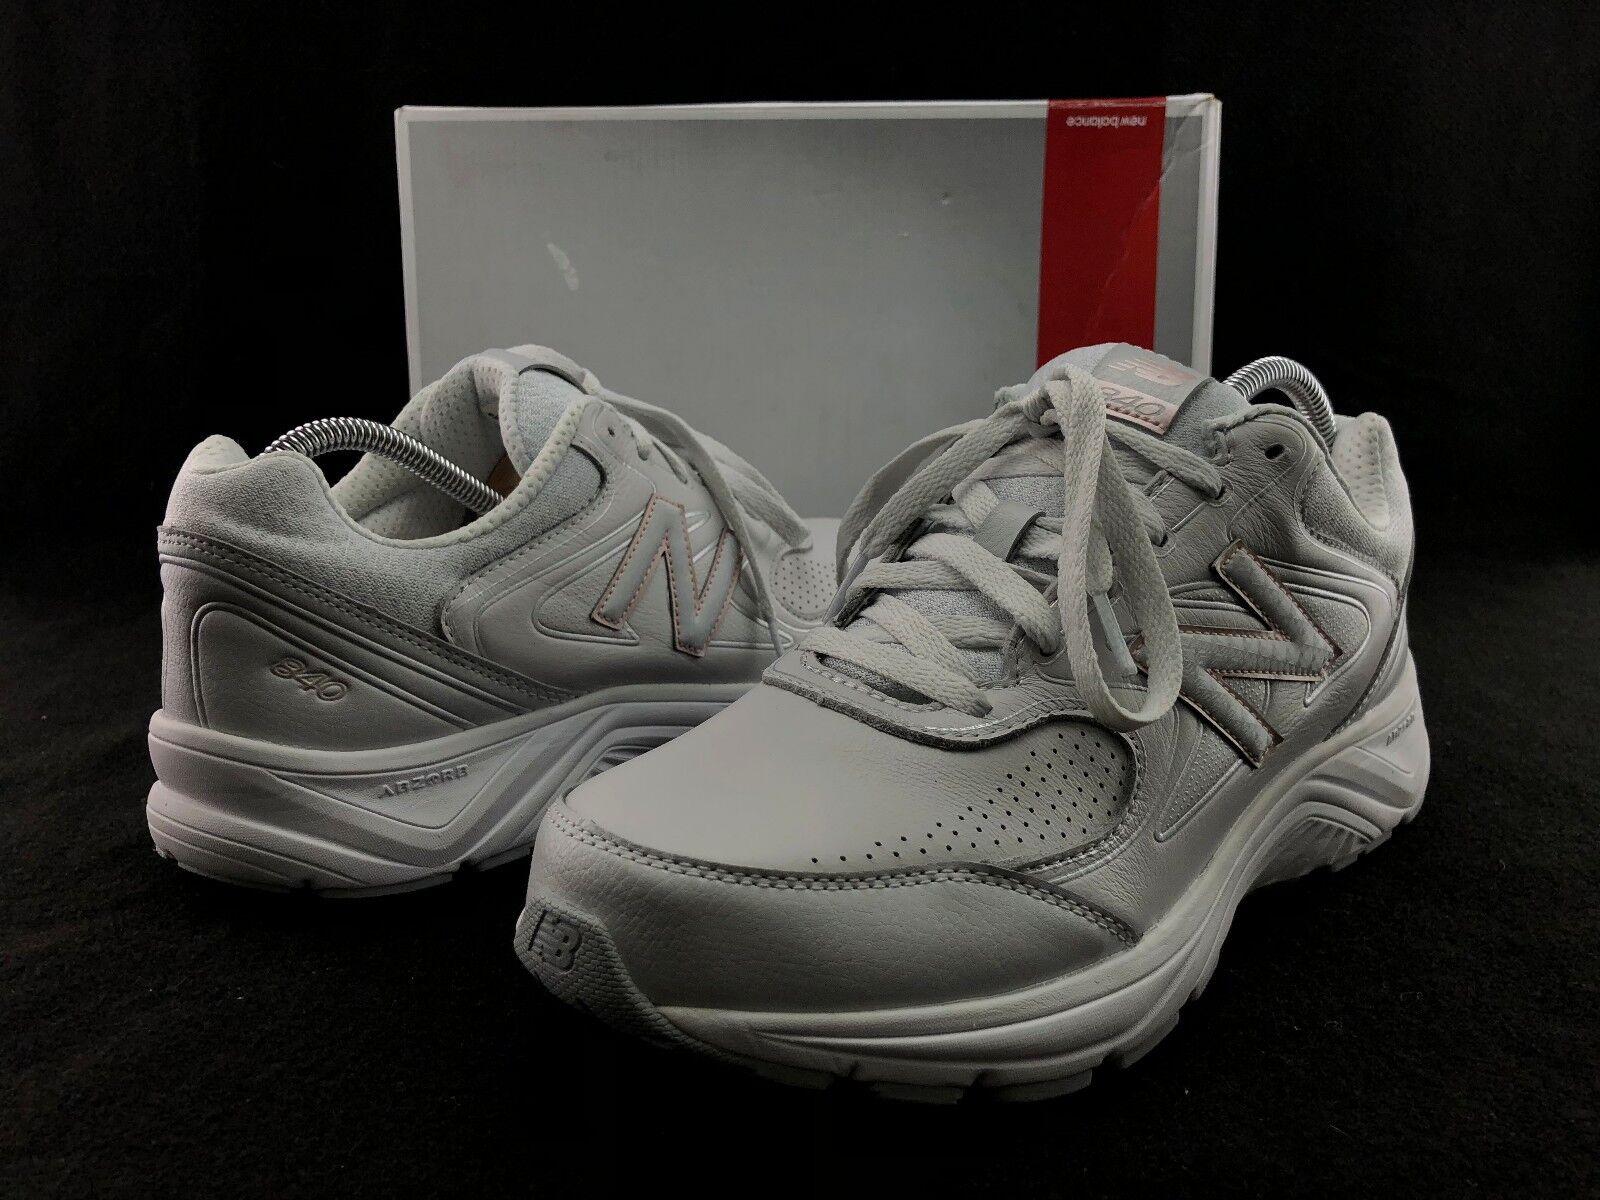 New Balance WW928GR2 Women's White Athletic Comfort Walking Shoes US 12 B C172